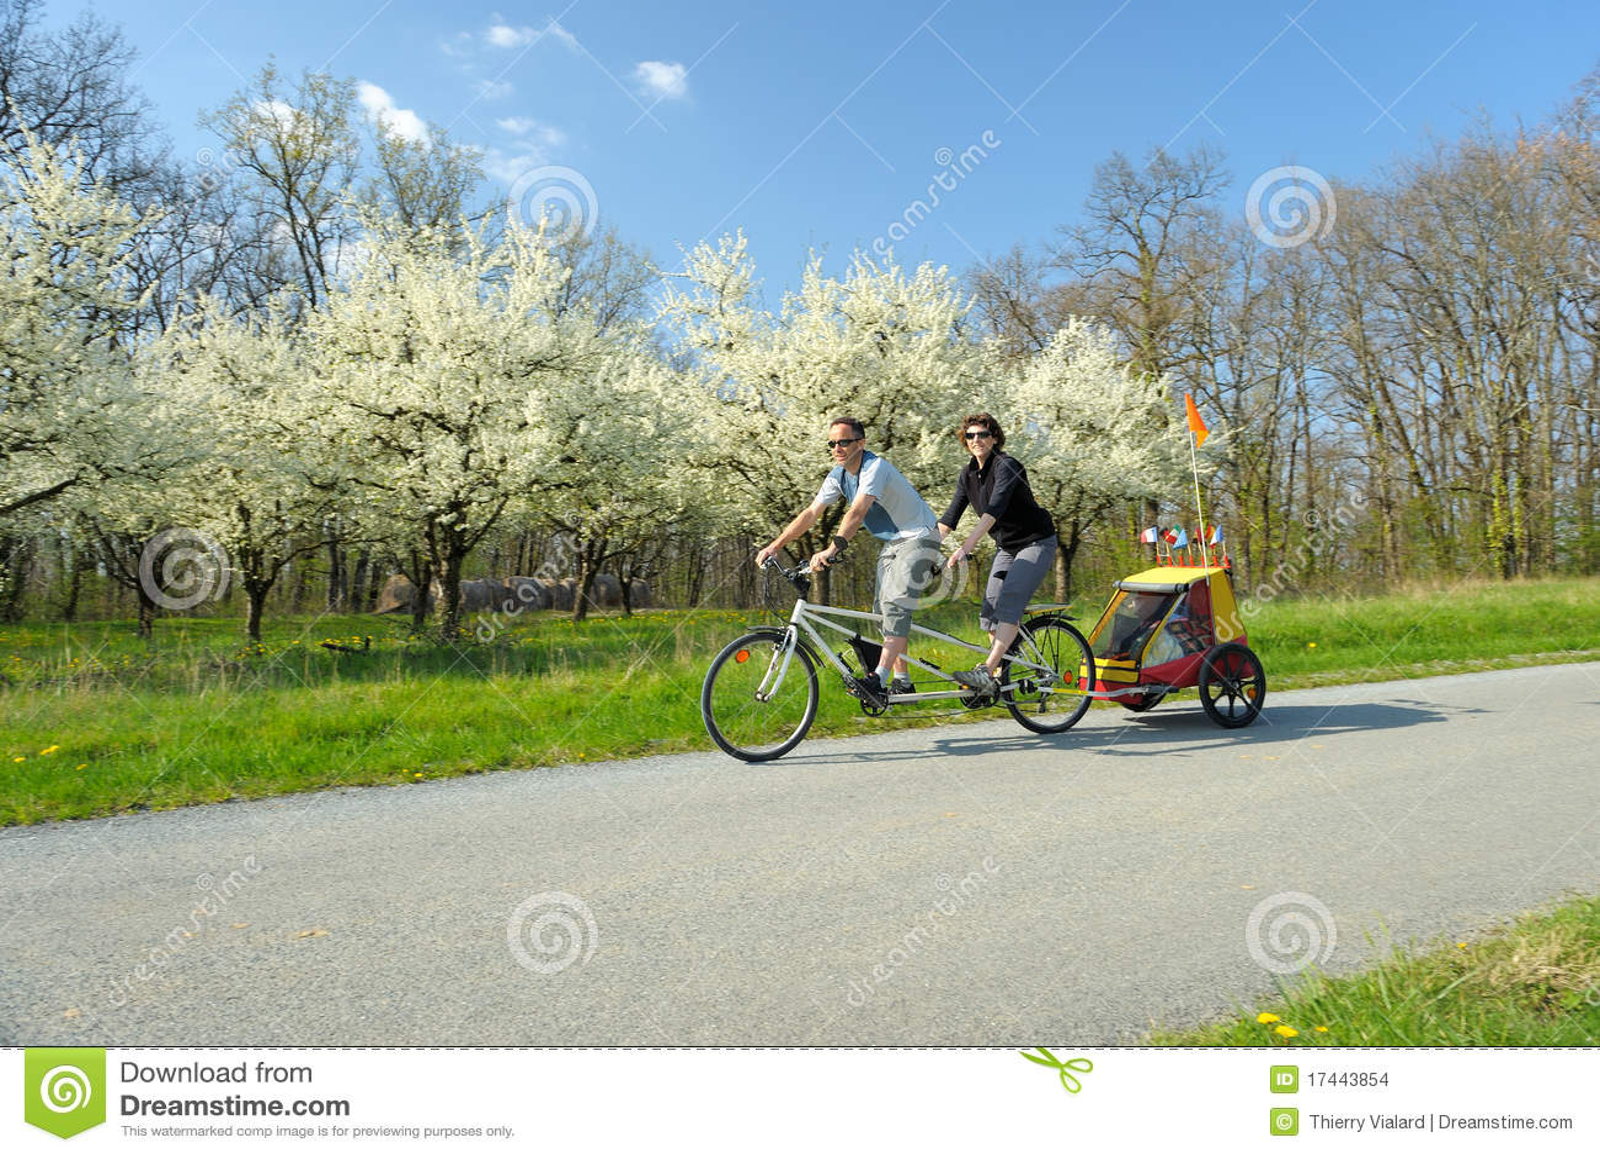 Bicicleta en tándem dos